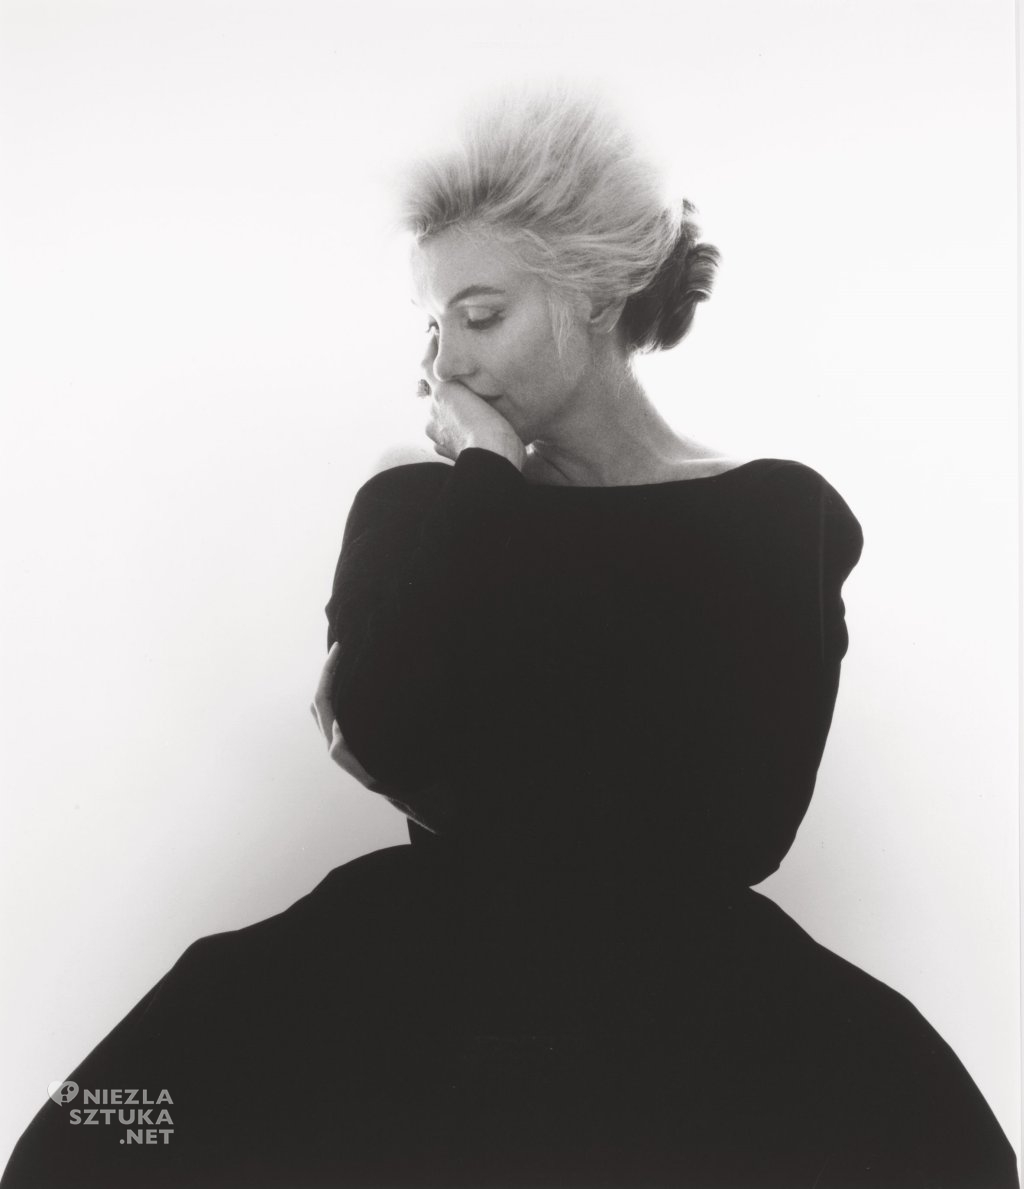 Marilyn Monroe, fot. Bert Stern dla Vogue'a | 1962, źródło: theredlist.com